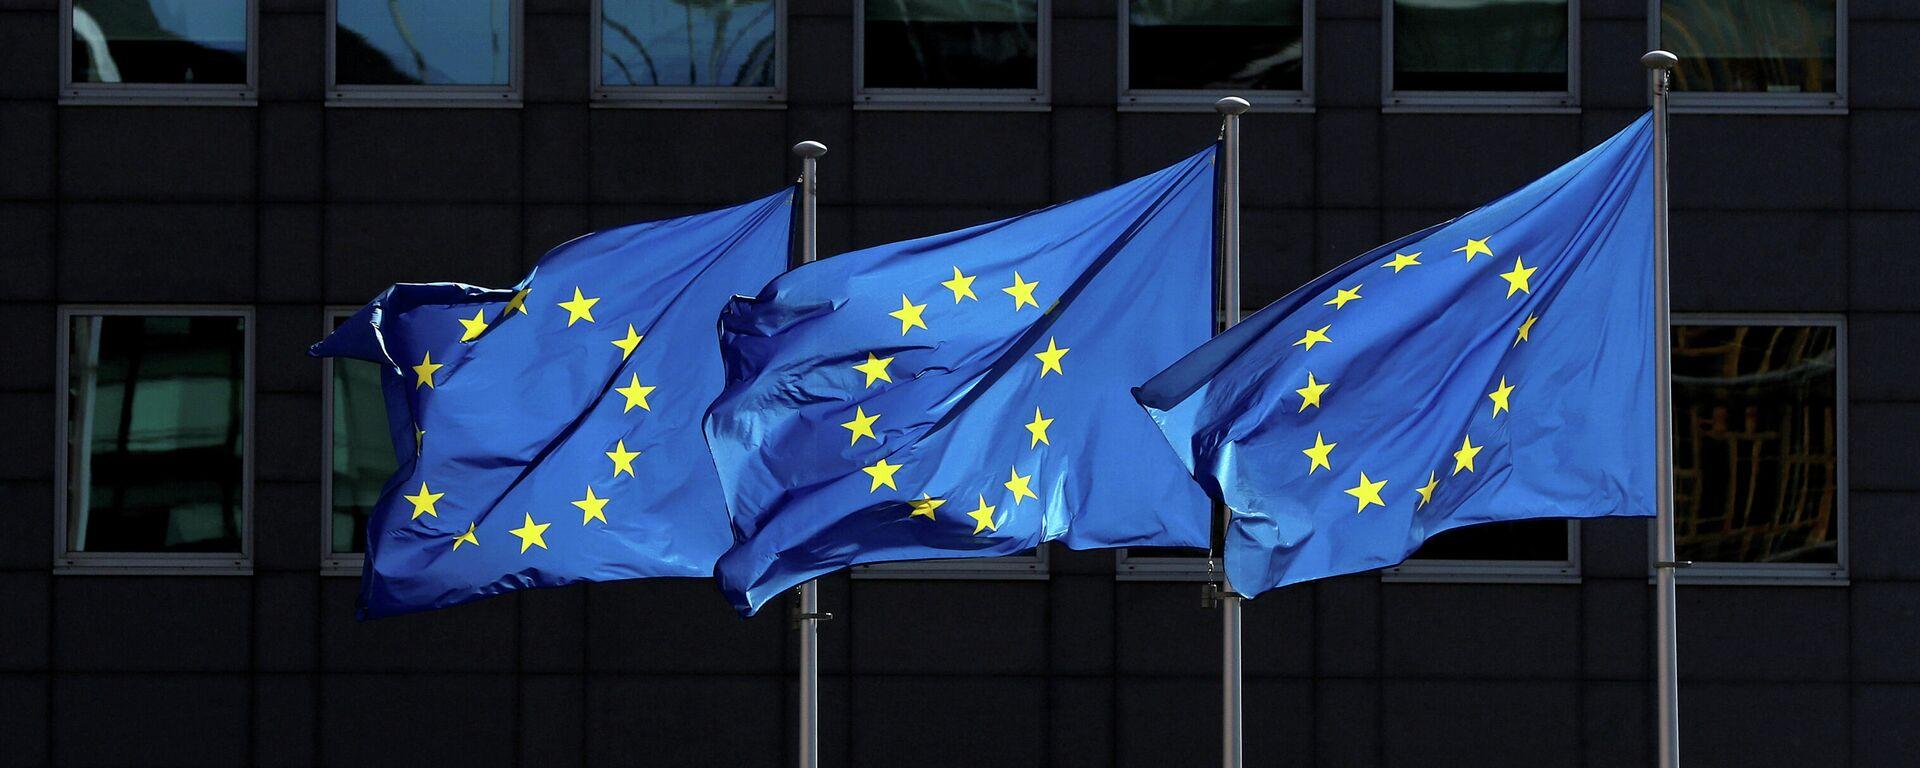 EU Flagge (Symbolbild) - SNA, 1920, 22.12.2020